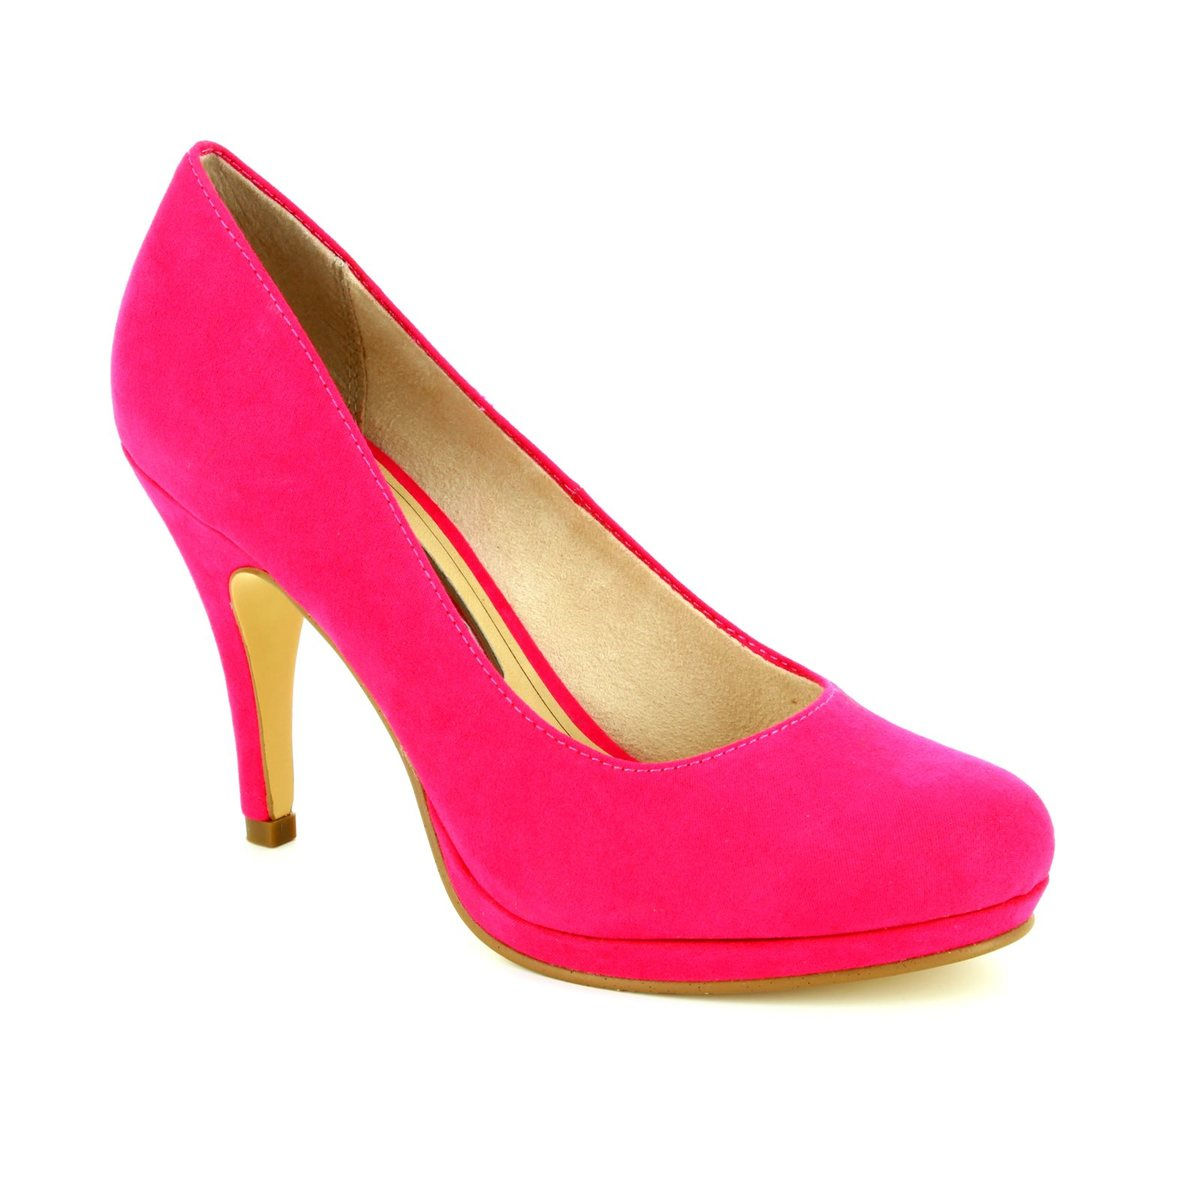 tamaris taggia 22407 513 fuchsia high heeled shoes. Black Bedroom Furniture Sets. Home Design Ideas